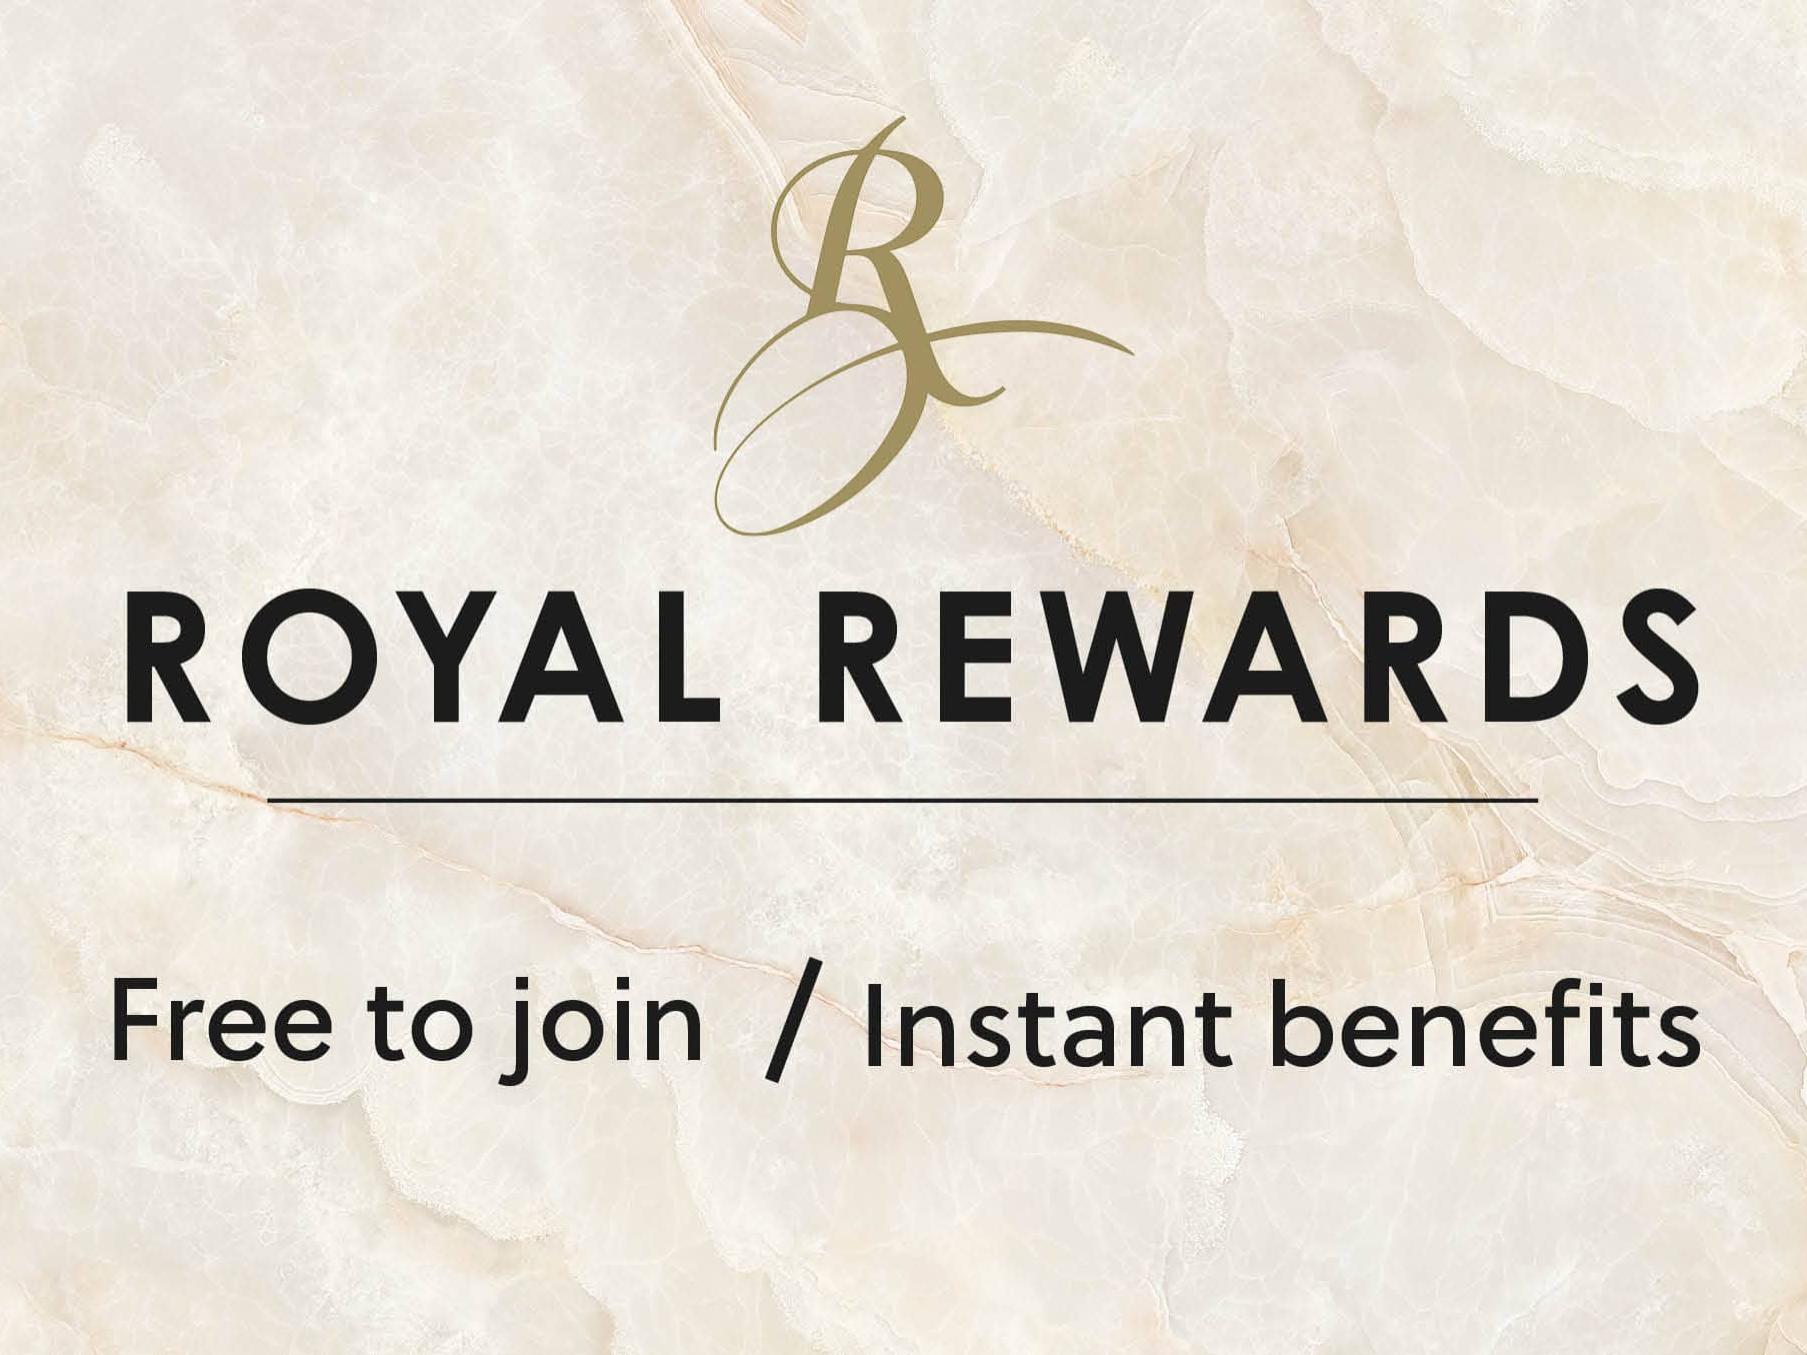 Royal Rewards Design image